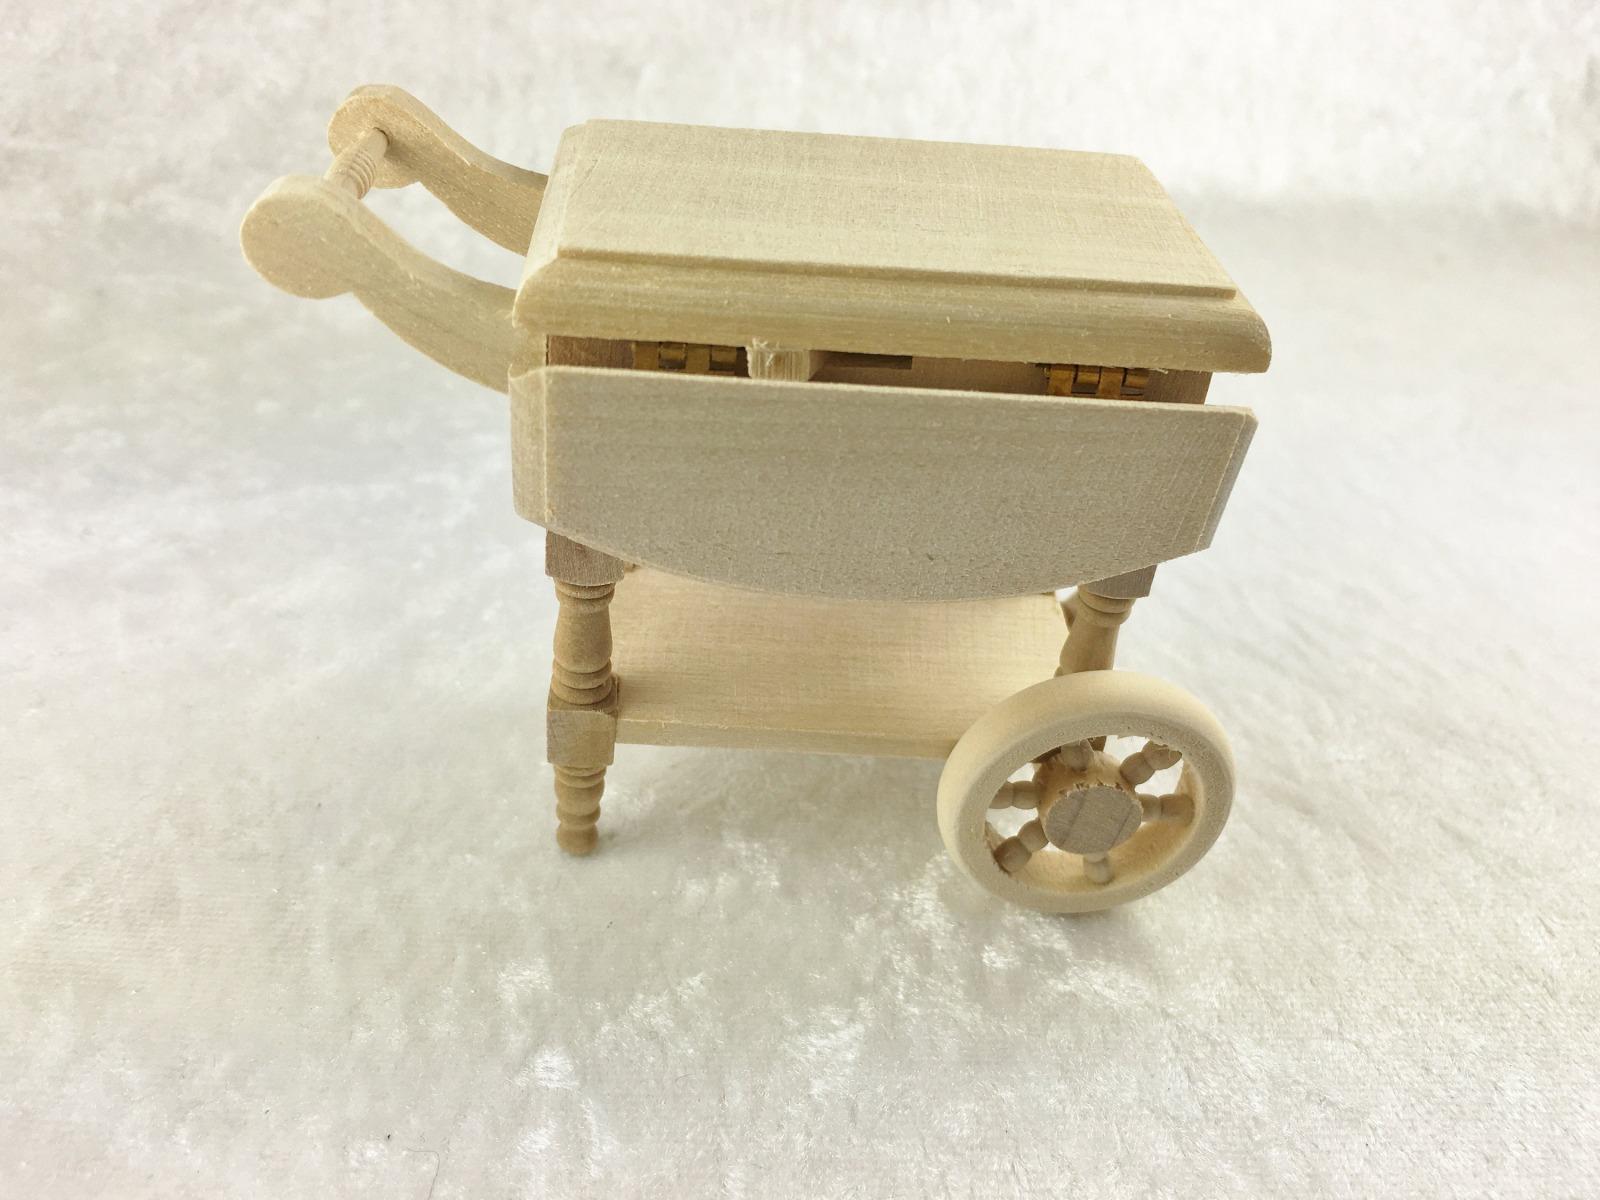 Teewagen 1:12 Miniatur 7